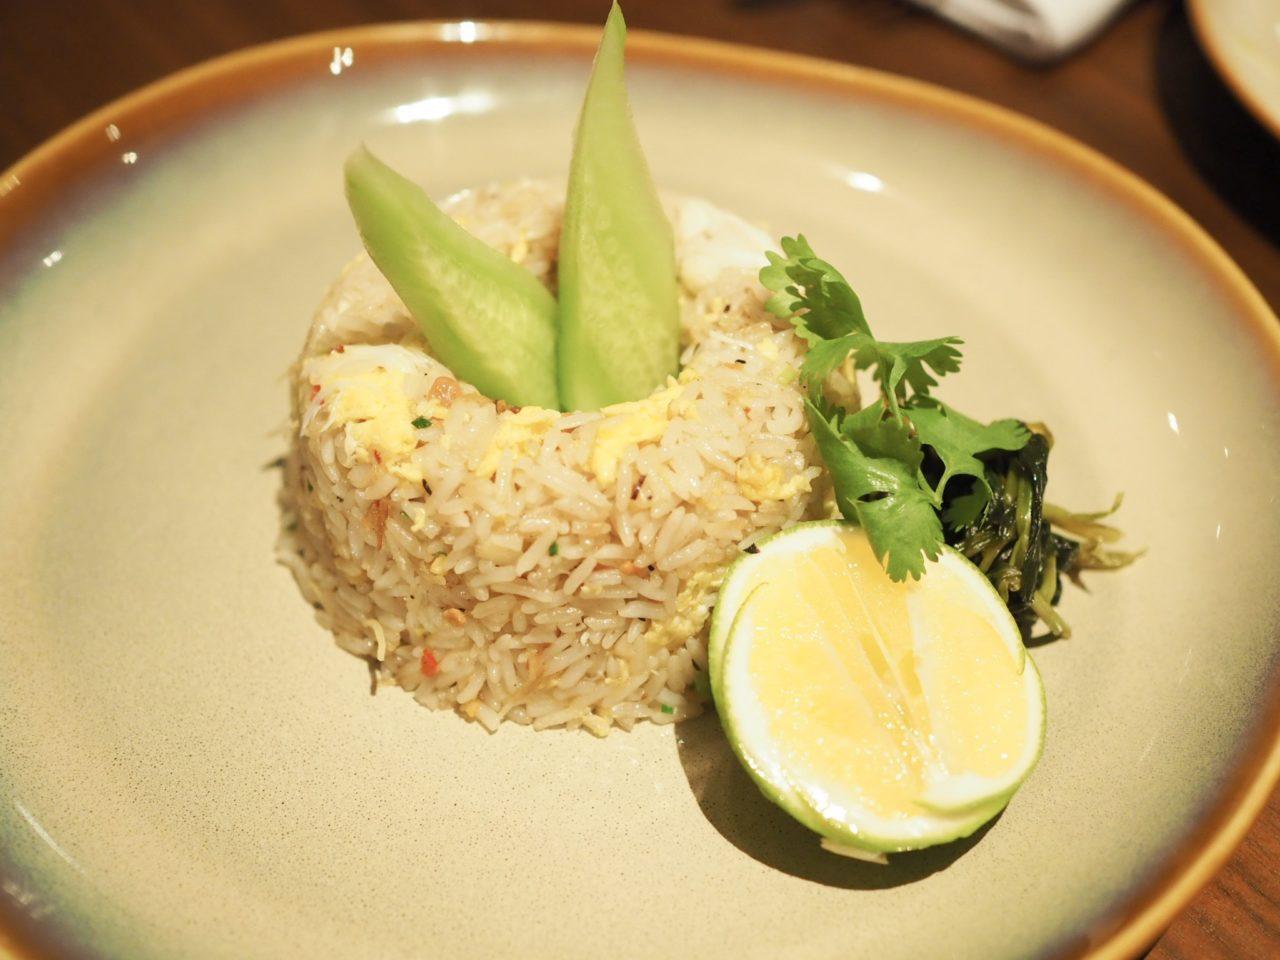 img 2952 - URBAN Cafe - スコータイ上海で味わう本場タイの味!期間限定メニューのご紹介